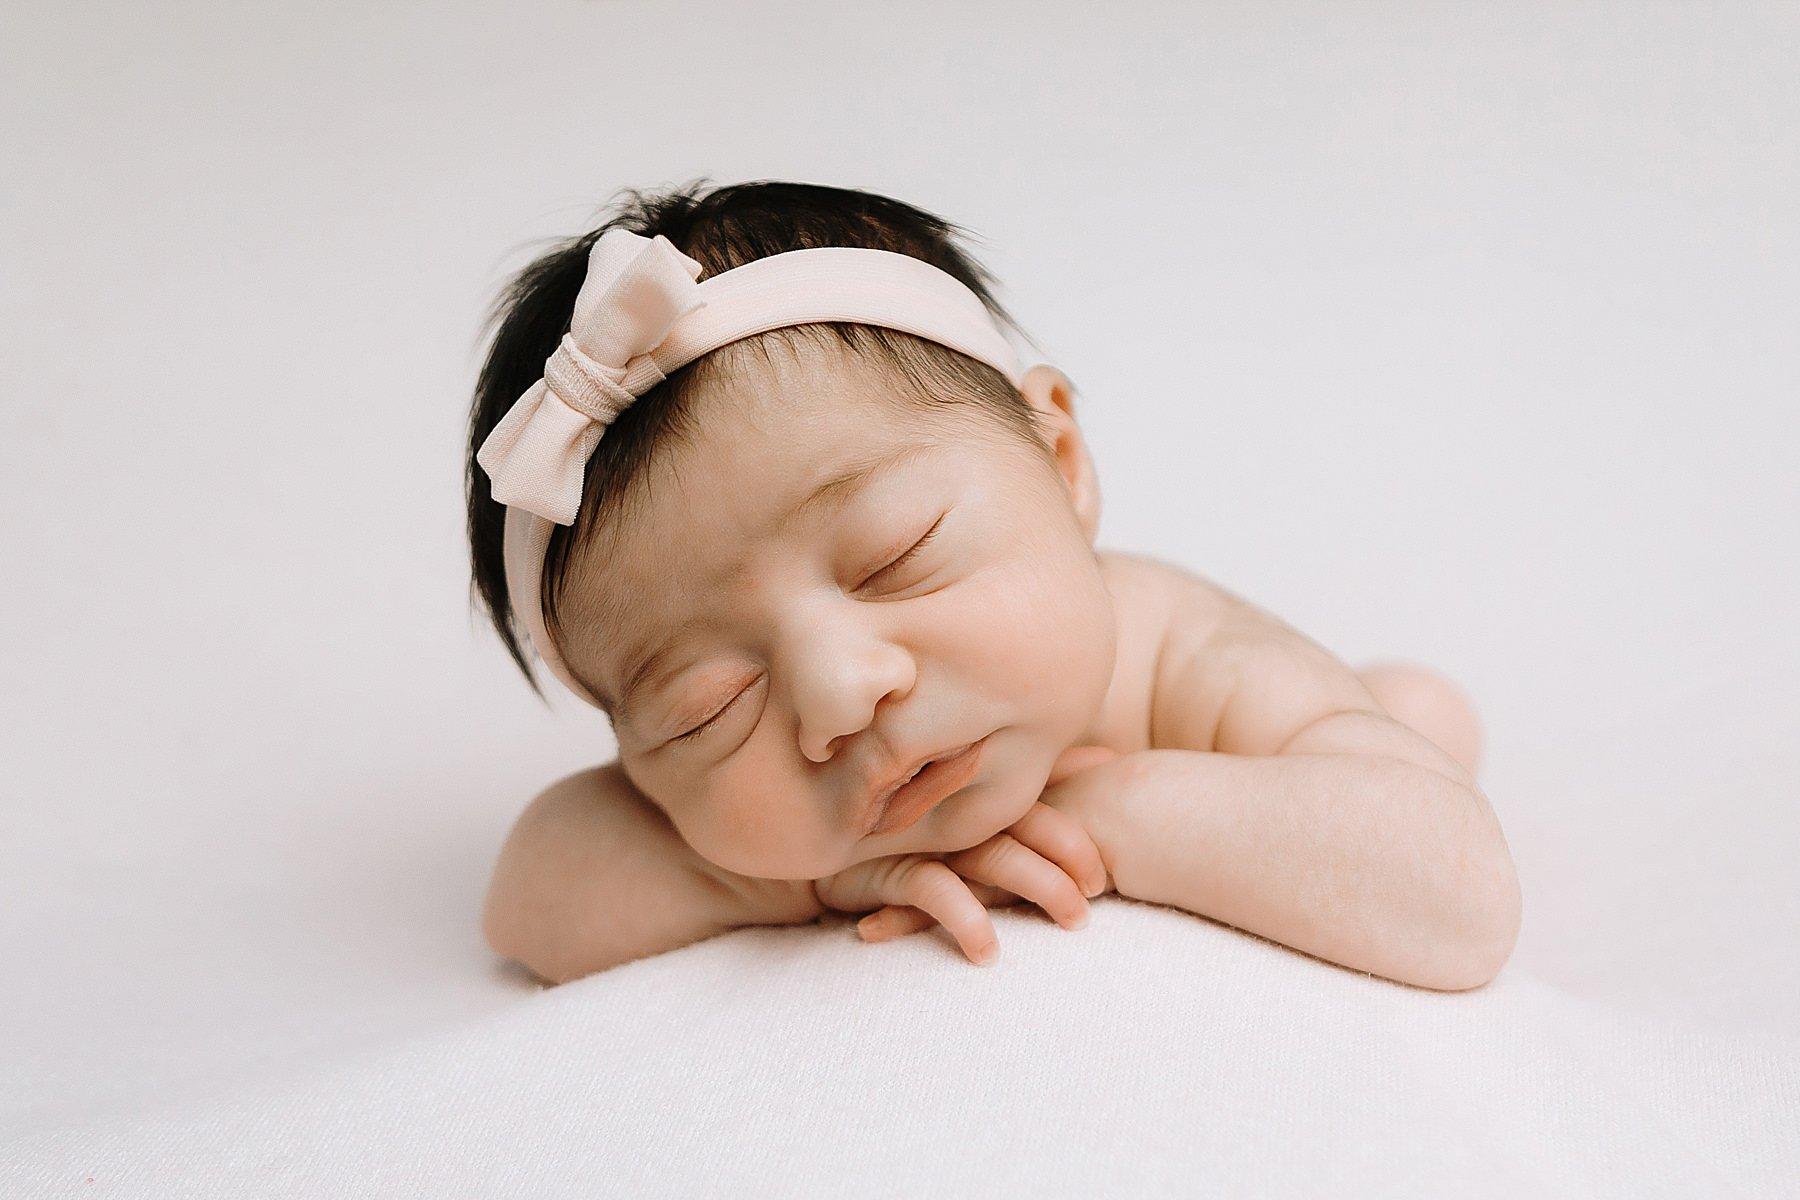 fotografa newborn firenze mugello babies